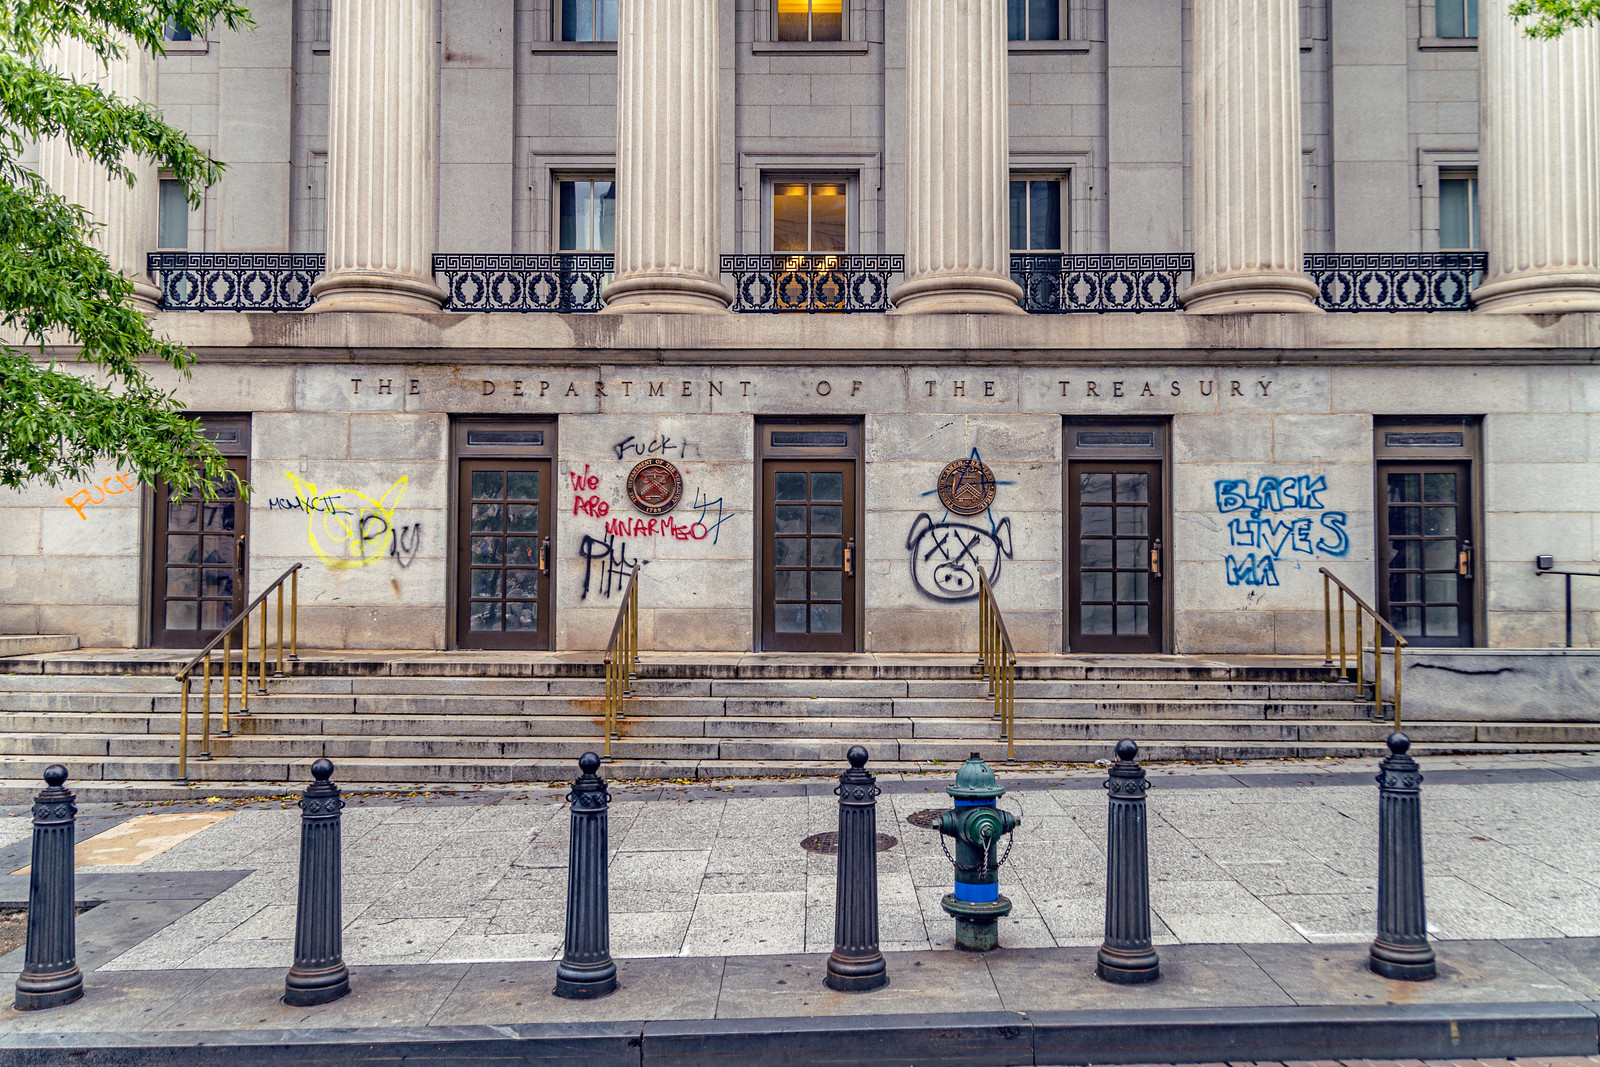 2020.06.05 Protesting the Murder of George Floyd, Washington, DC USA 157 34219